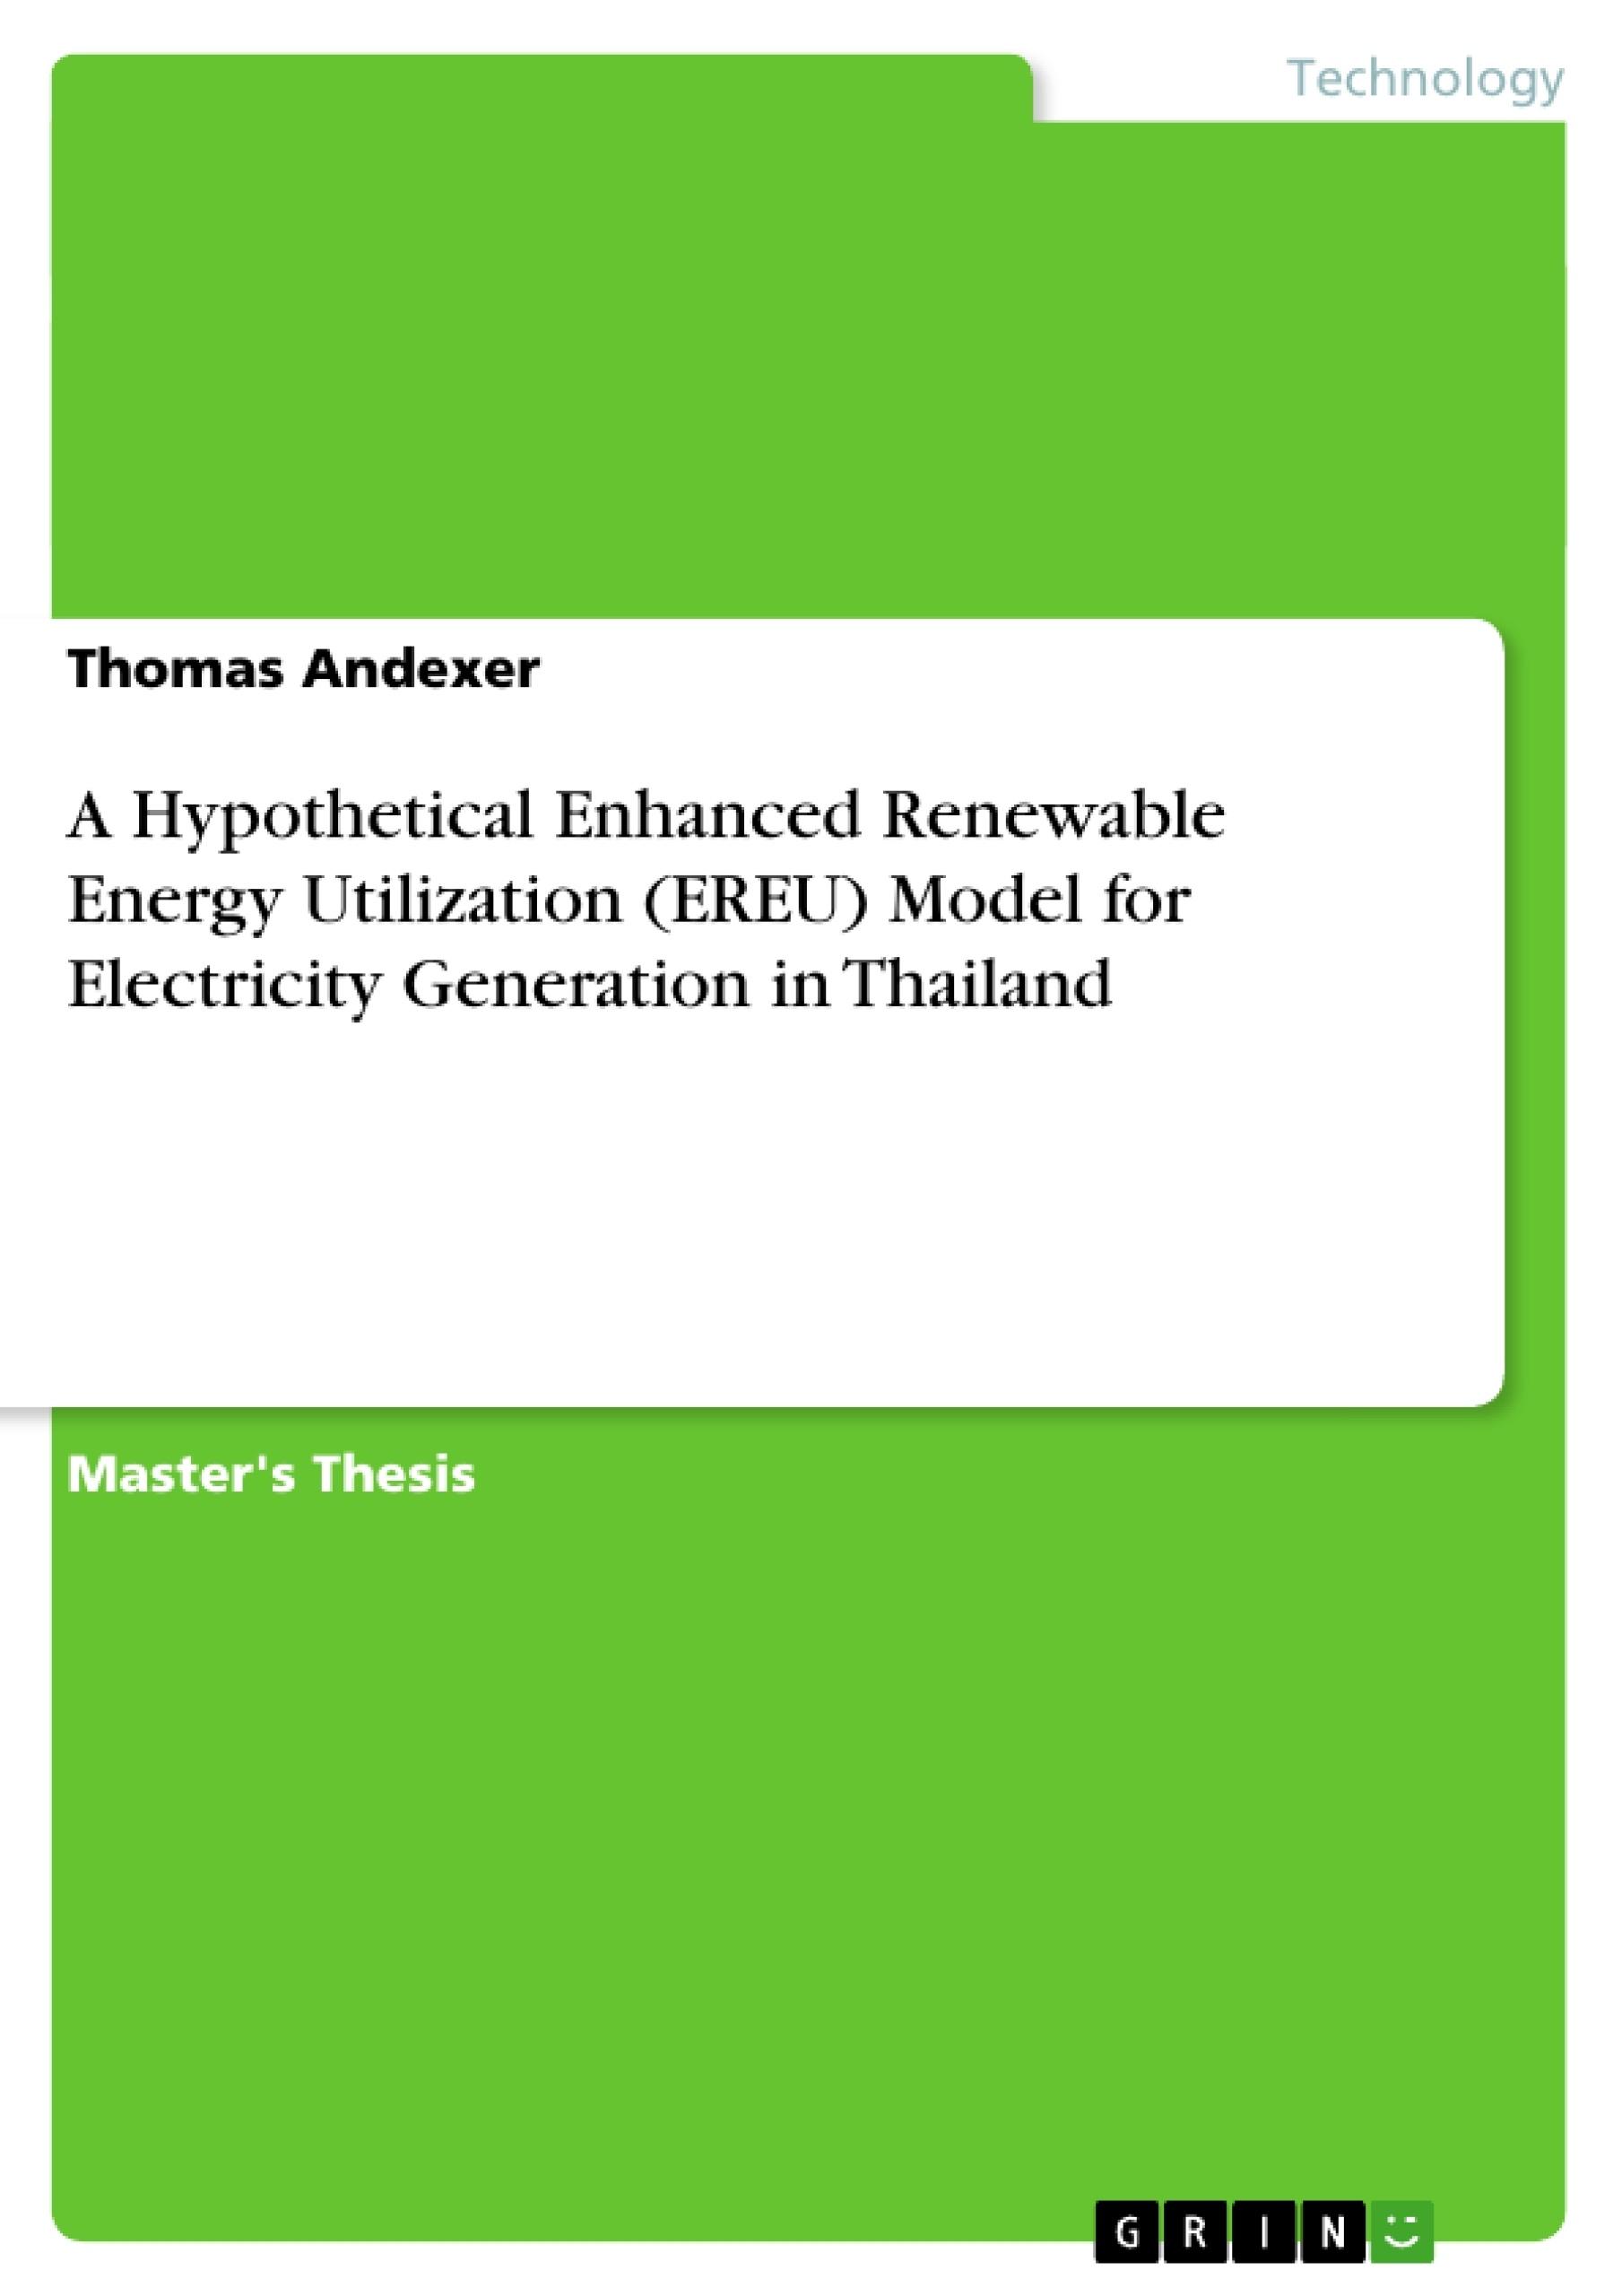 GRIN - A Hypothetical Enhanced Renewable Energy Utilization (EREU) Model  for Electricity Generation in Thailand